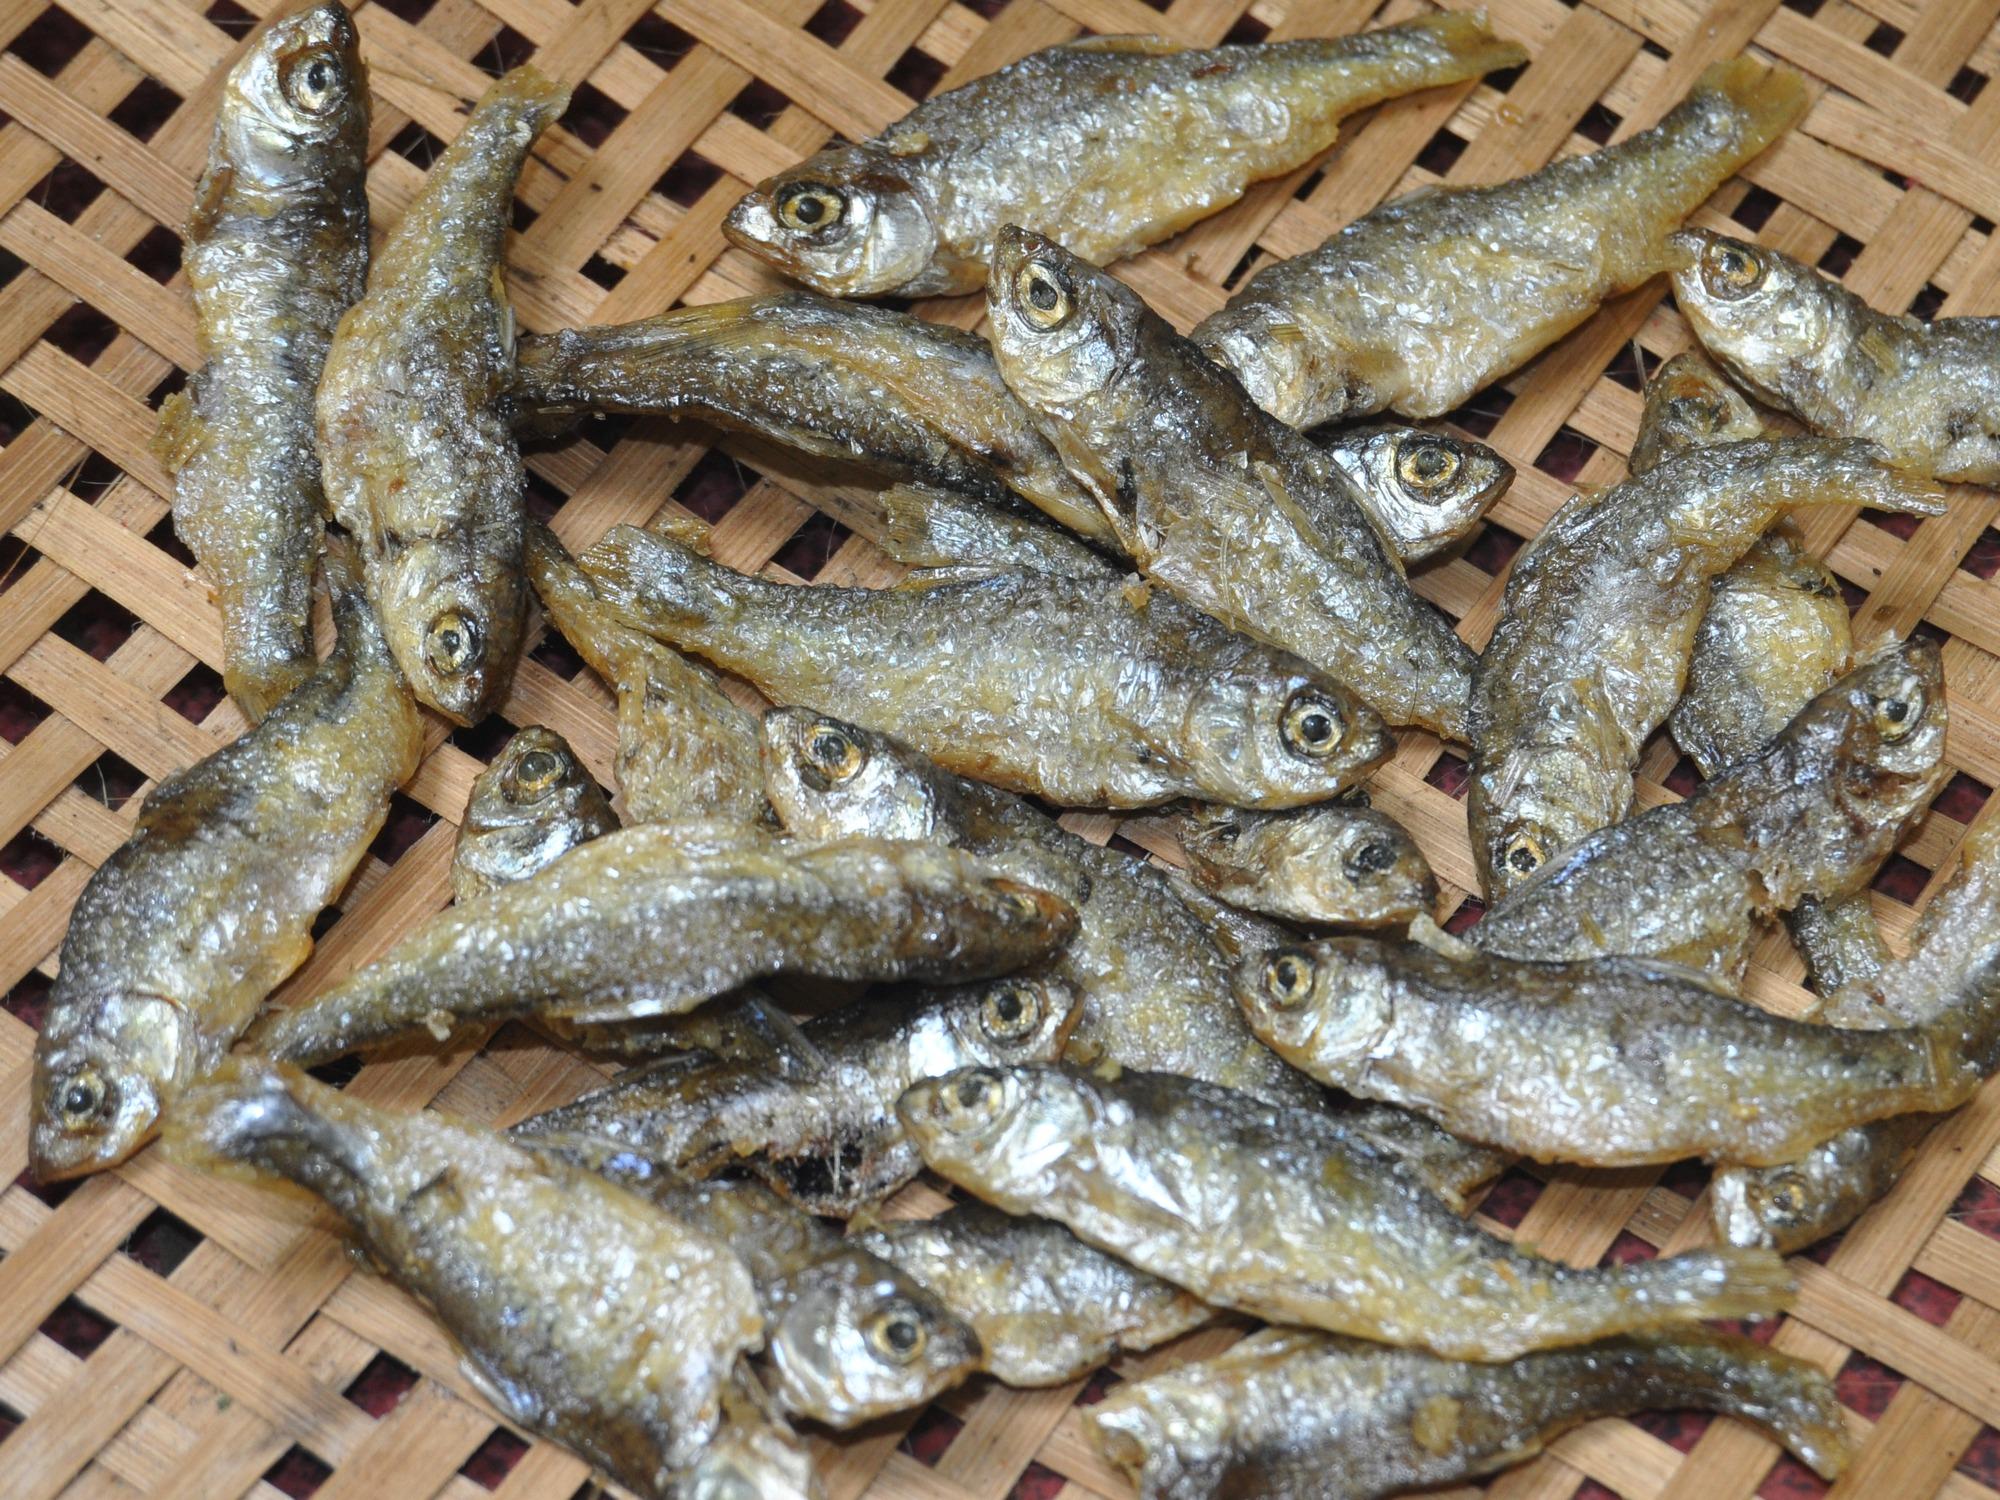 Peluang Usaha Budidaya Ikan Bilis Dan Analisa Usahanya - Agrowindo